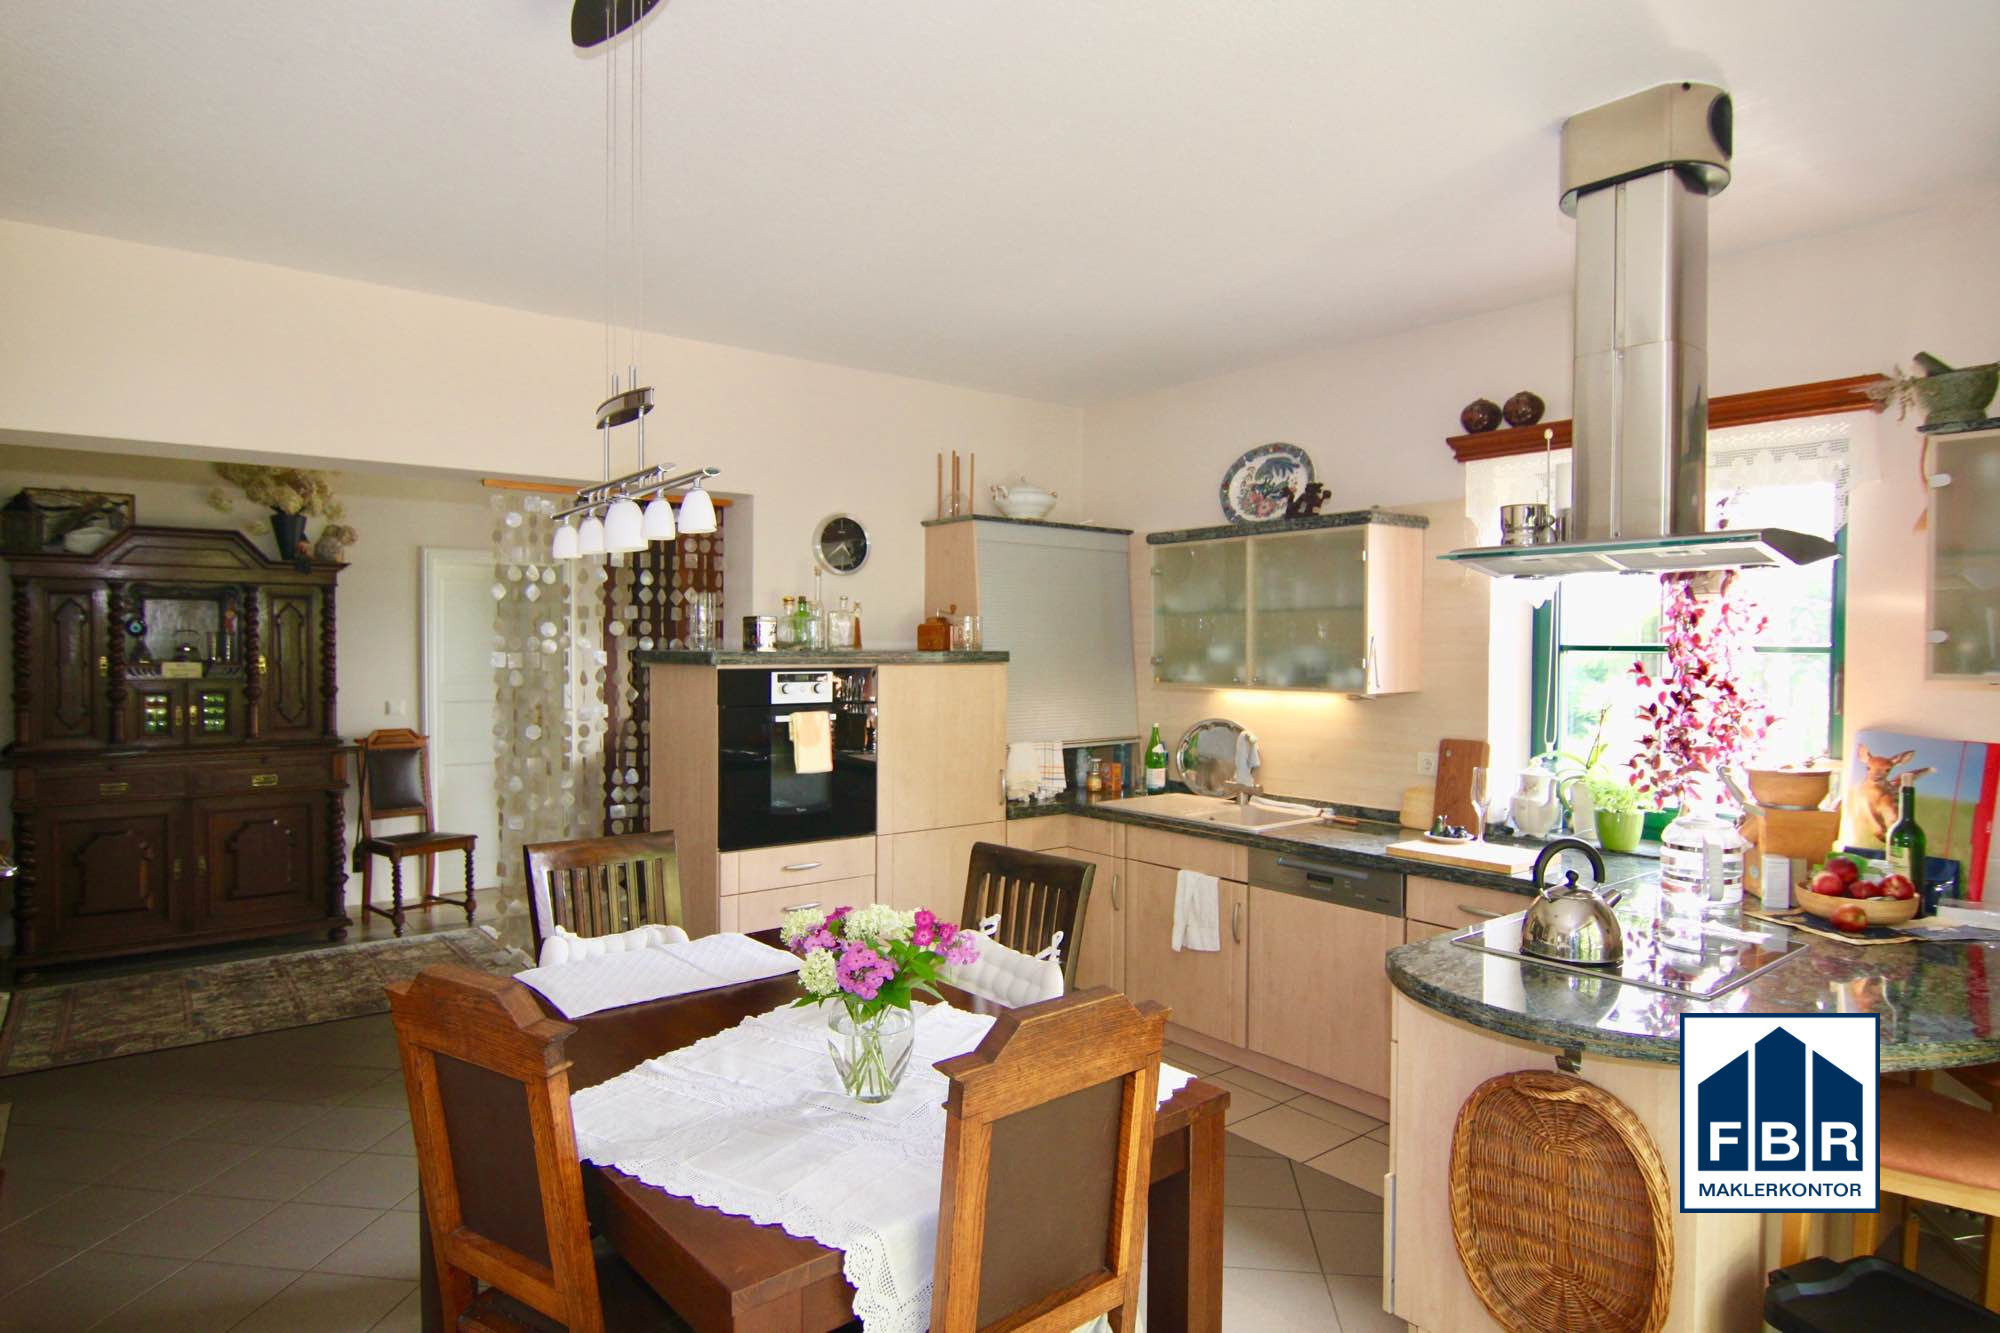 Wohnküche Teil 2